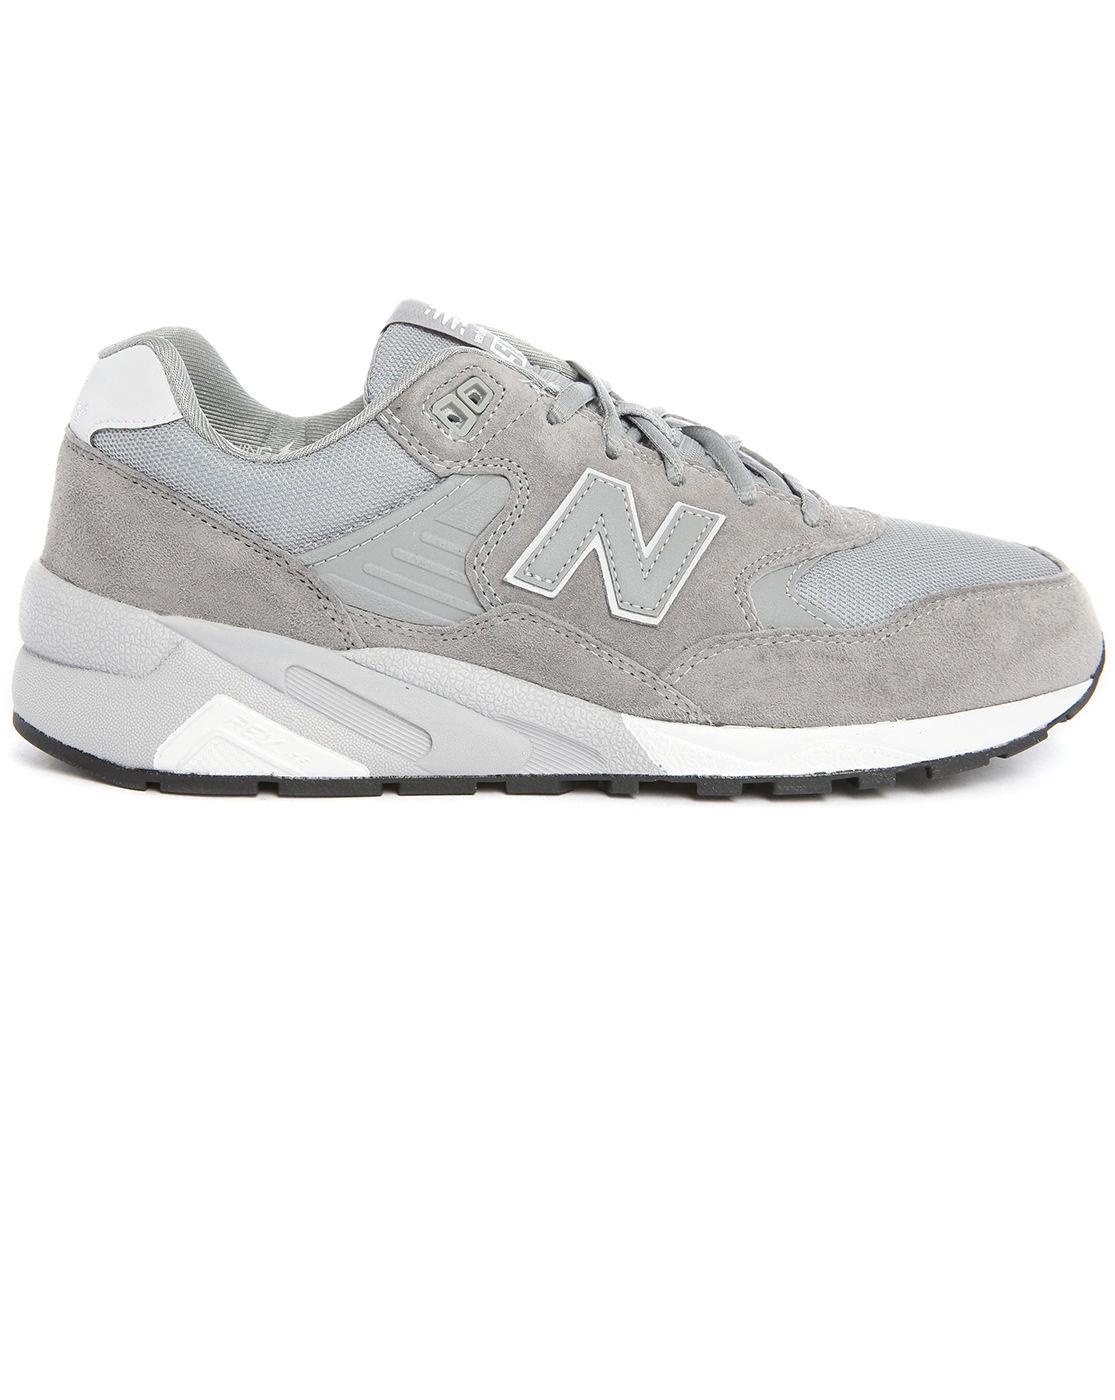 new balance 580 grey trainers khaki